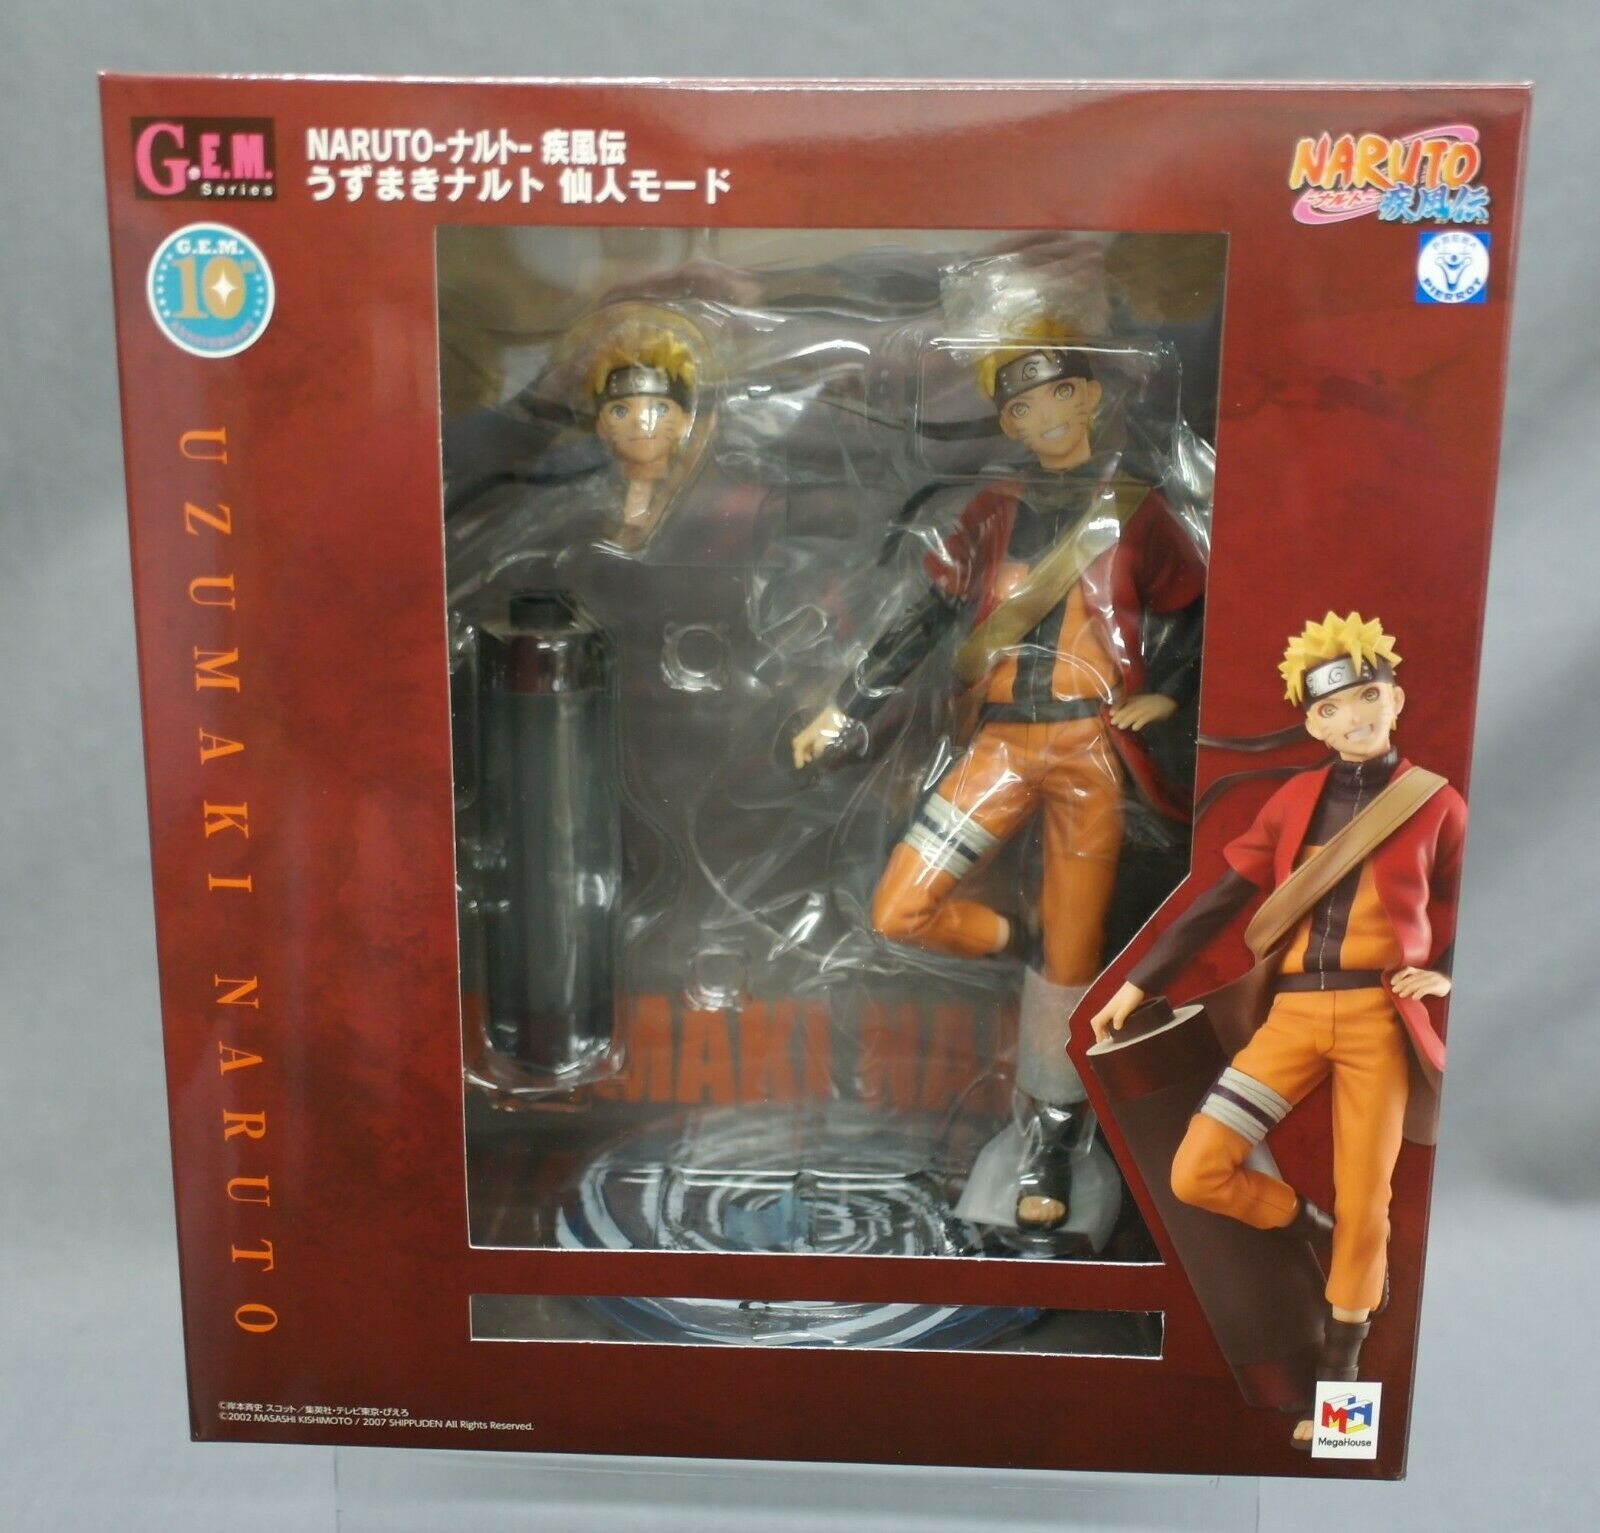 G.E.M. Series NARUTO Shippuden Naruto Uzumaki Sage Mode MegaHouse Japan New